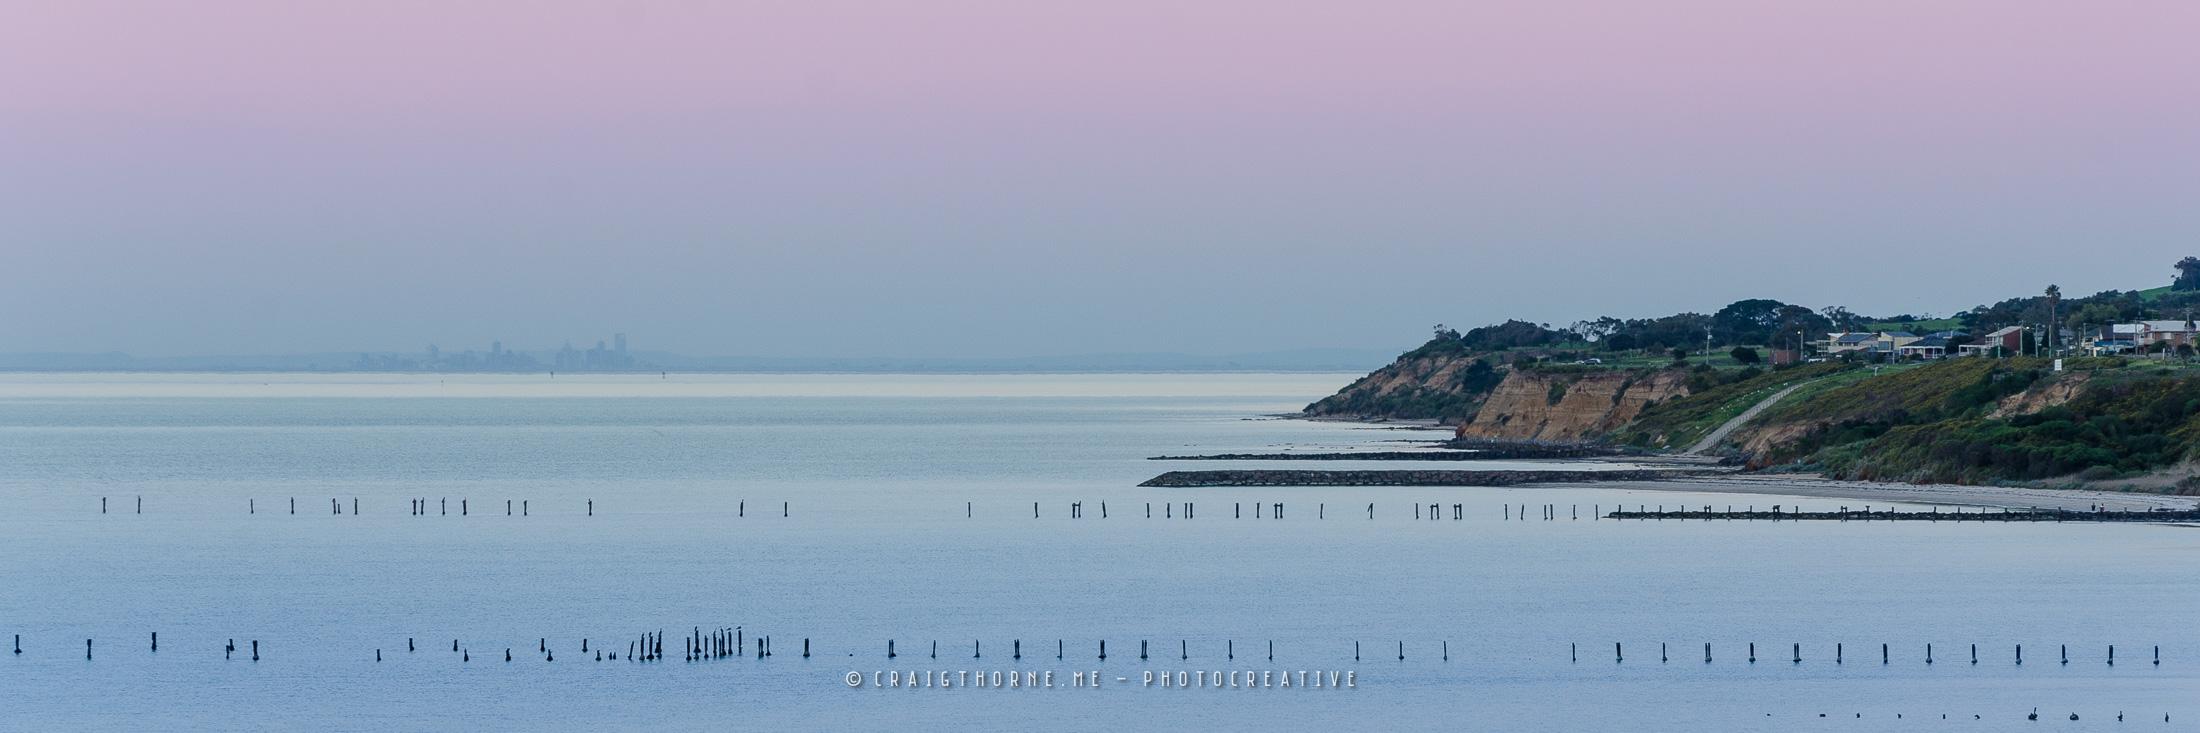 20140923-03-Panoramas-by-Craig-Thorne-THN_4730.jpg